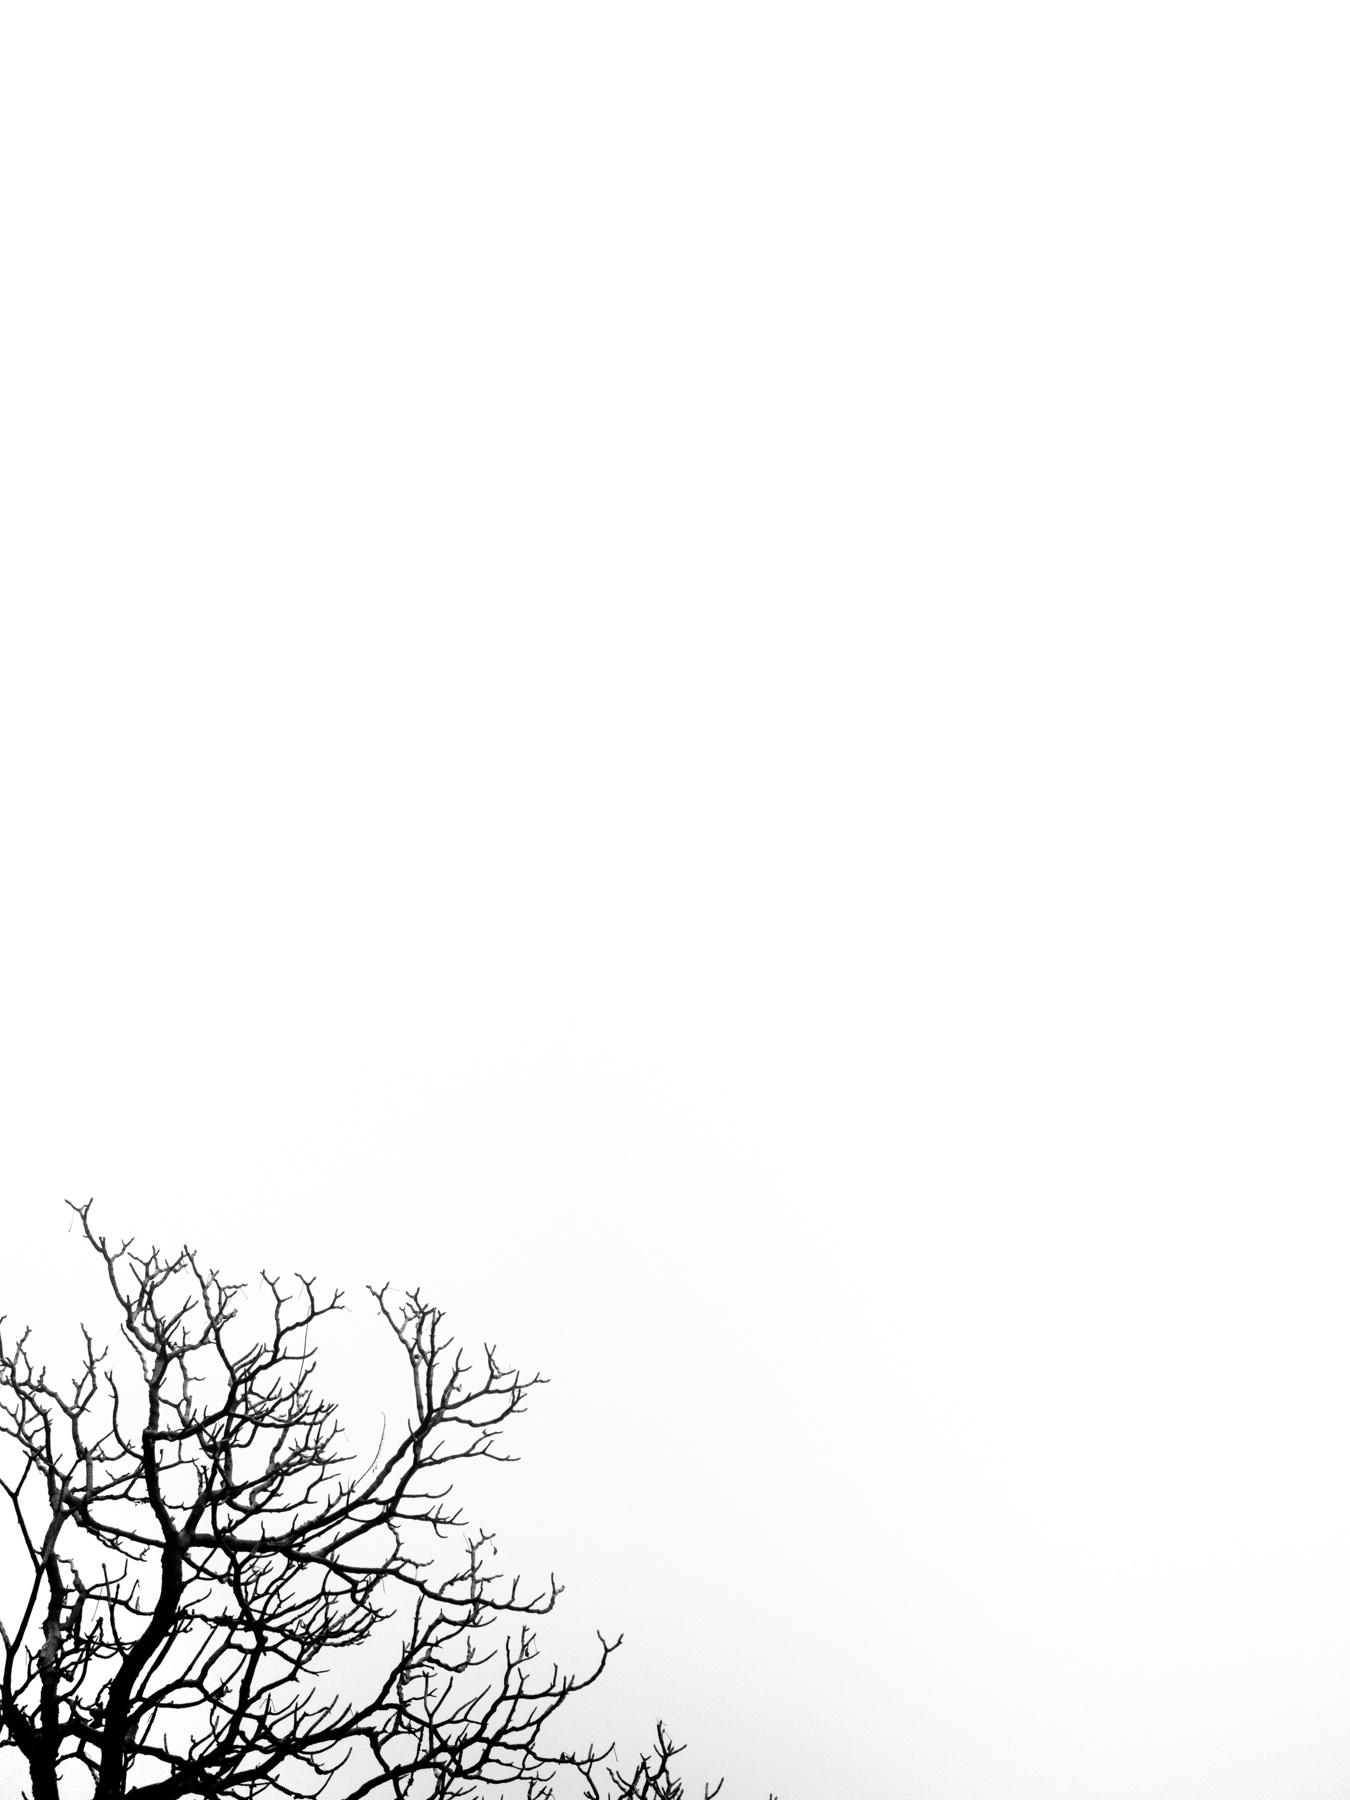 Wasim Muklashy Photography_Sequoia National Park_California_December 2015_-SAM_4312.jpg